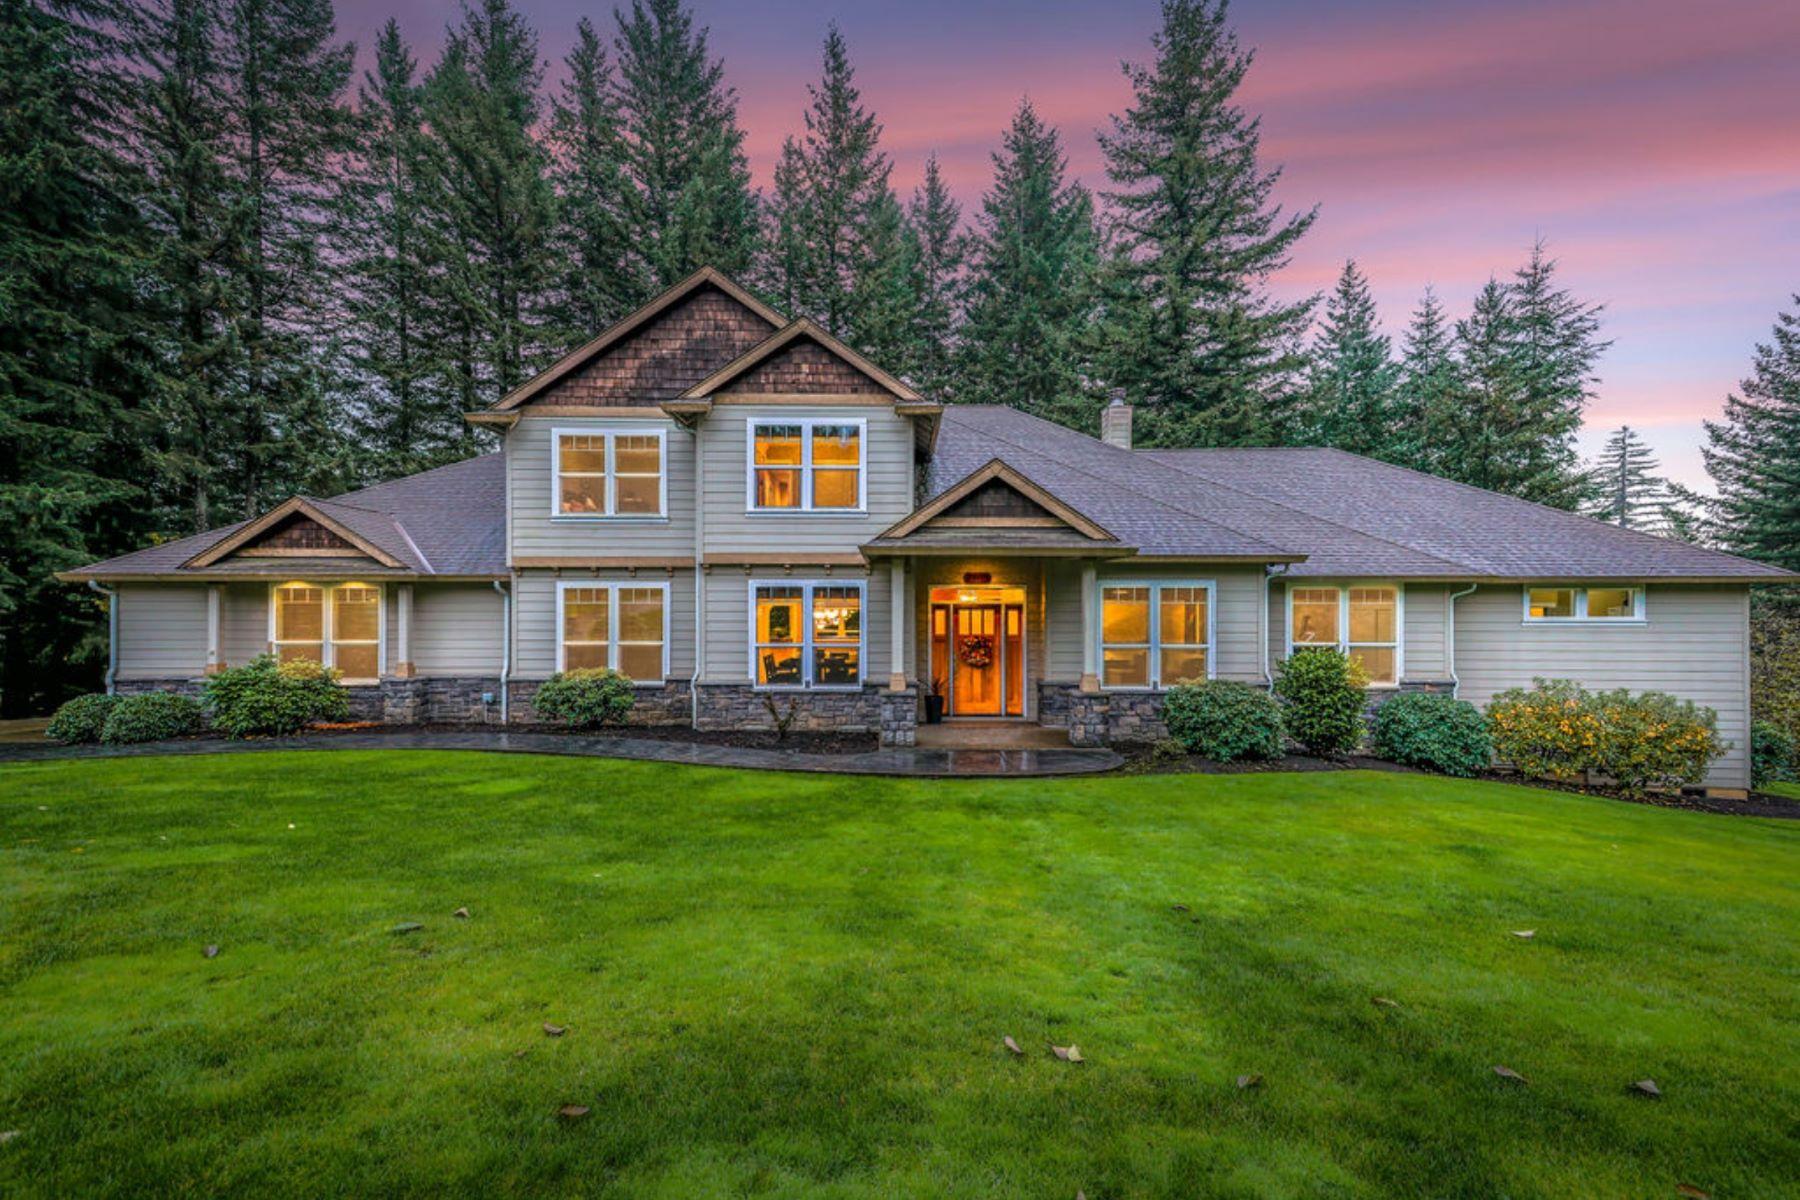 Single Family Homes for Sale at Beautiful 2-Story Custom Craftsman 29419 64th Way Camas, Washington 98607 United States